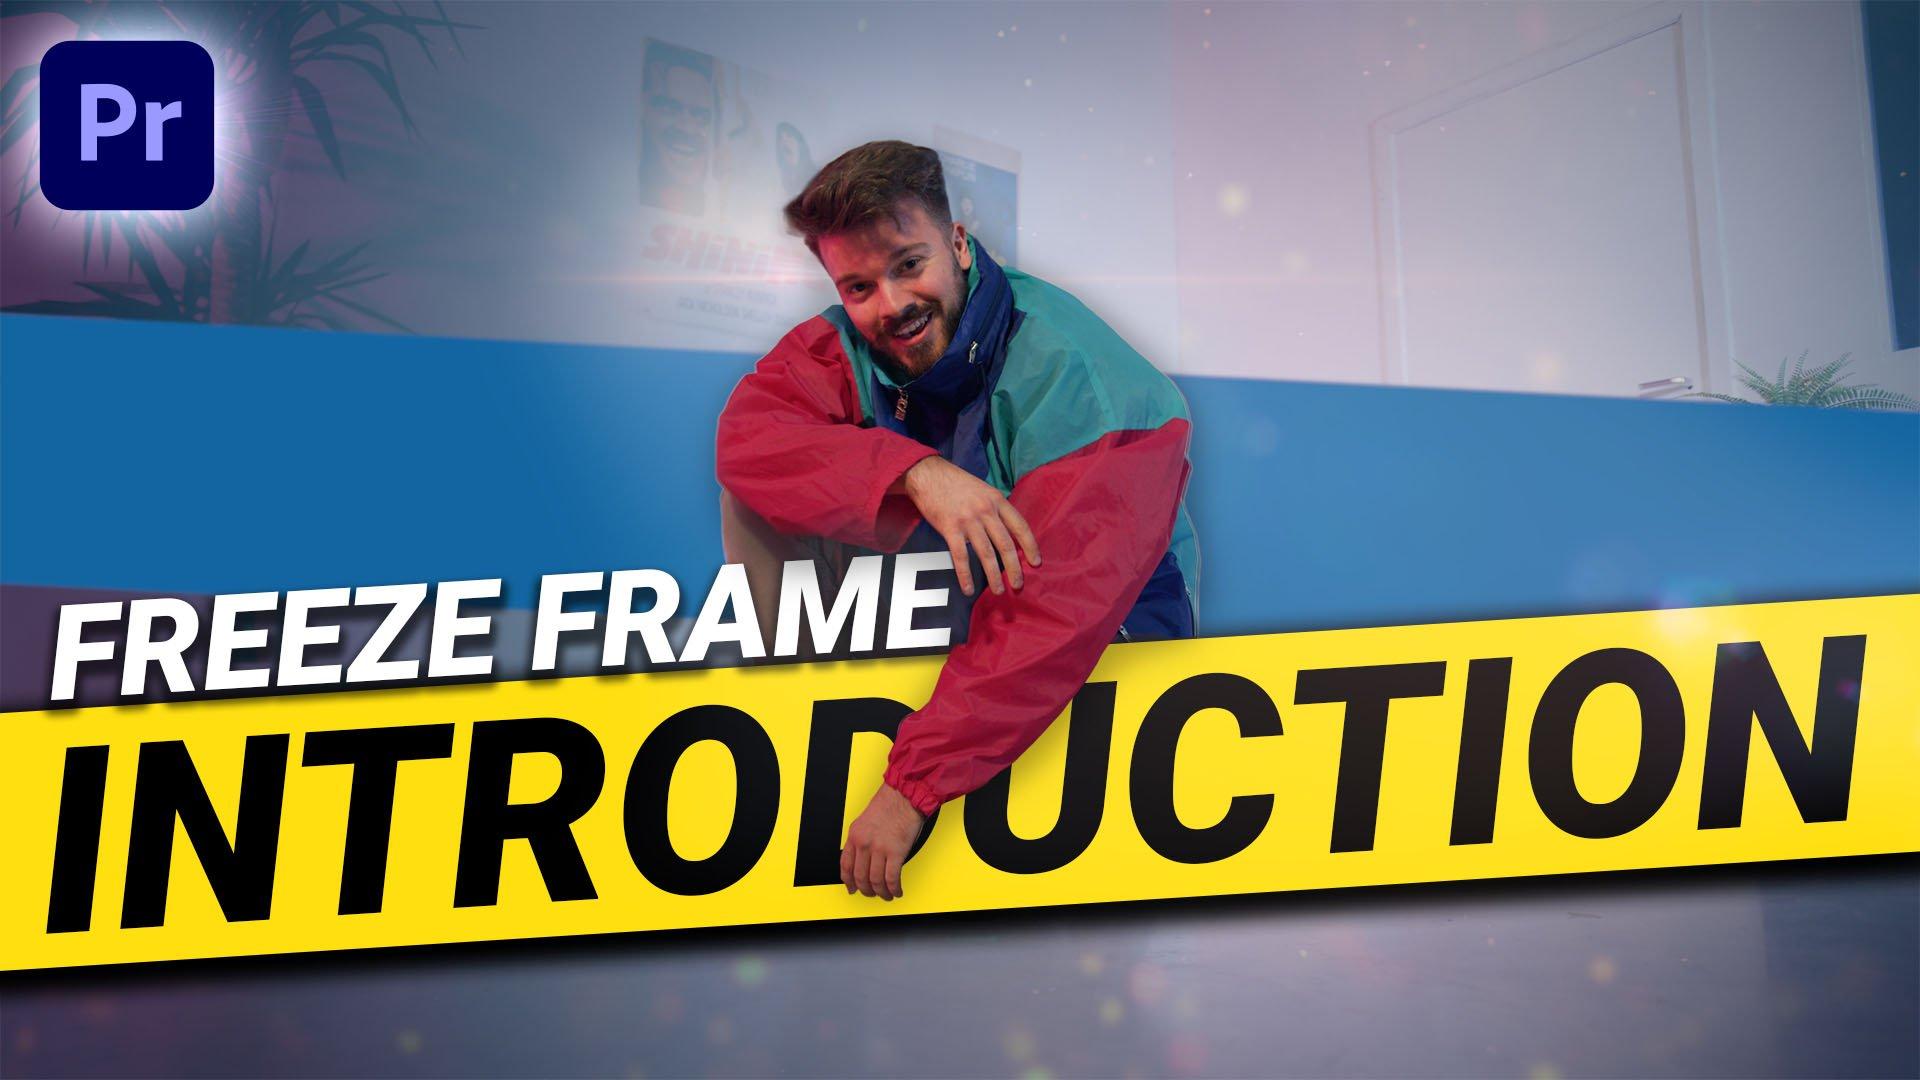 freeze-frame-introduction